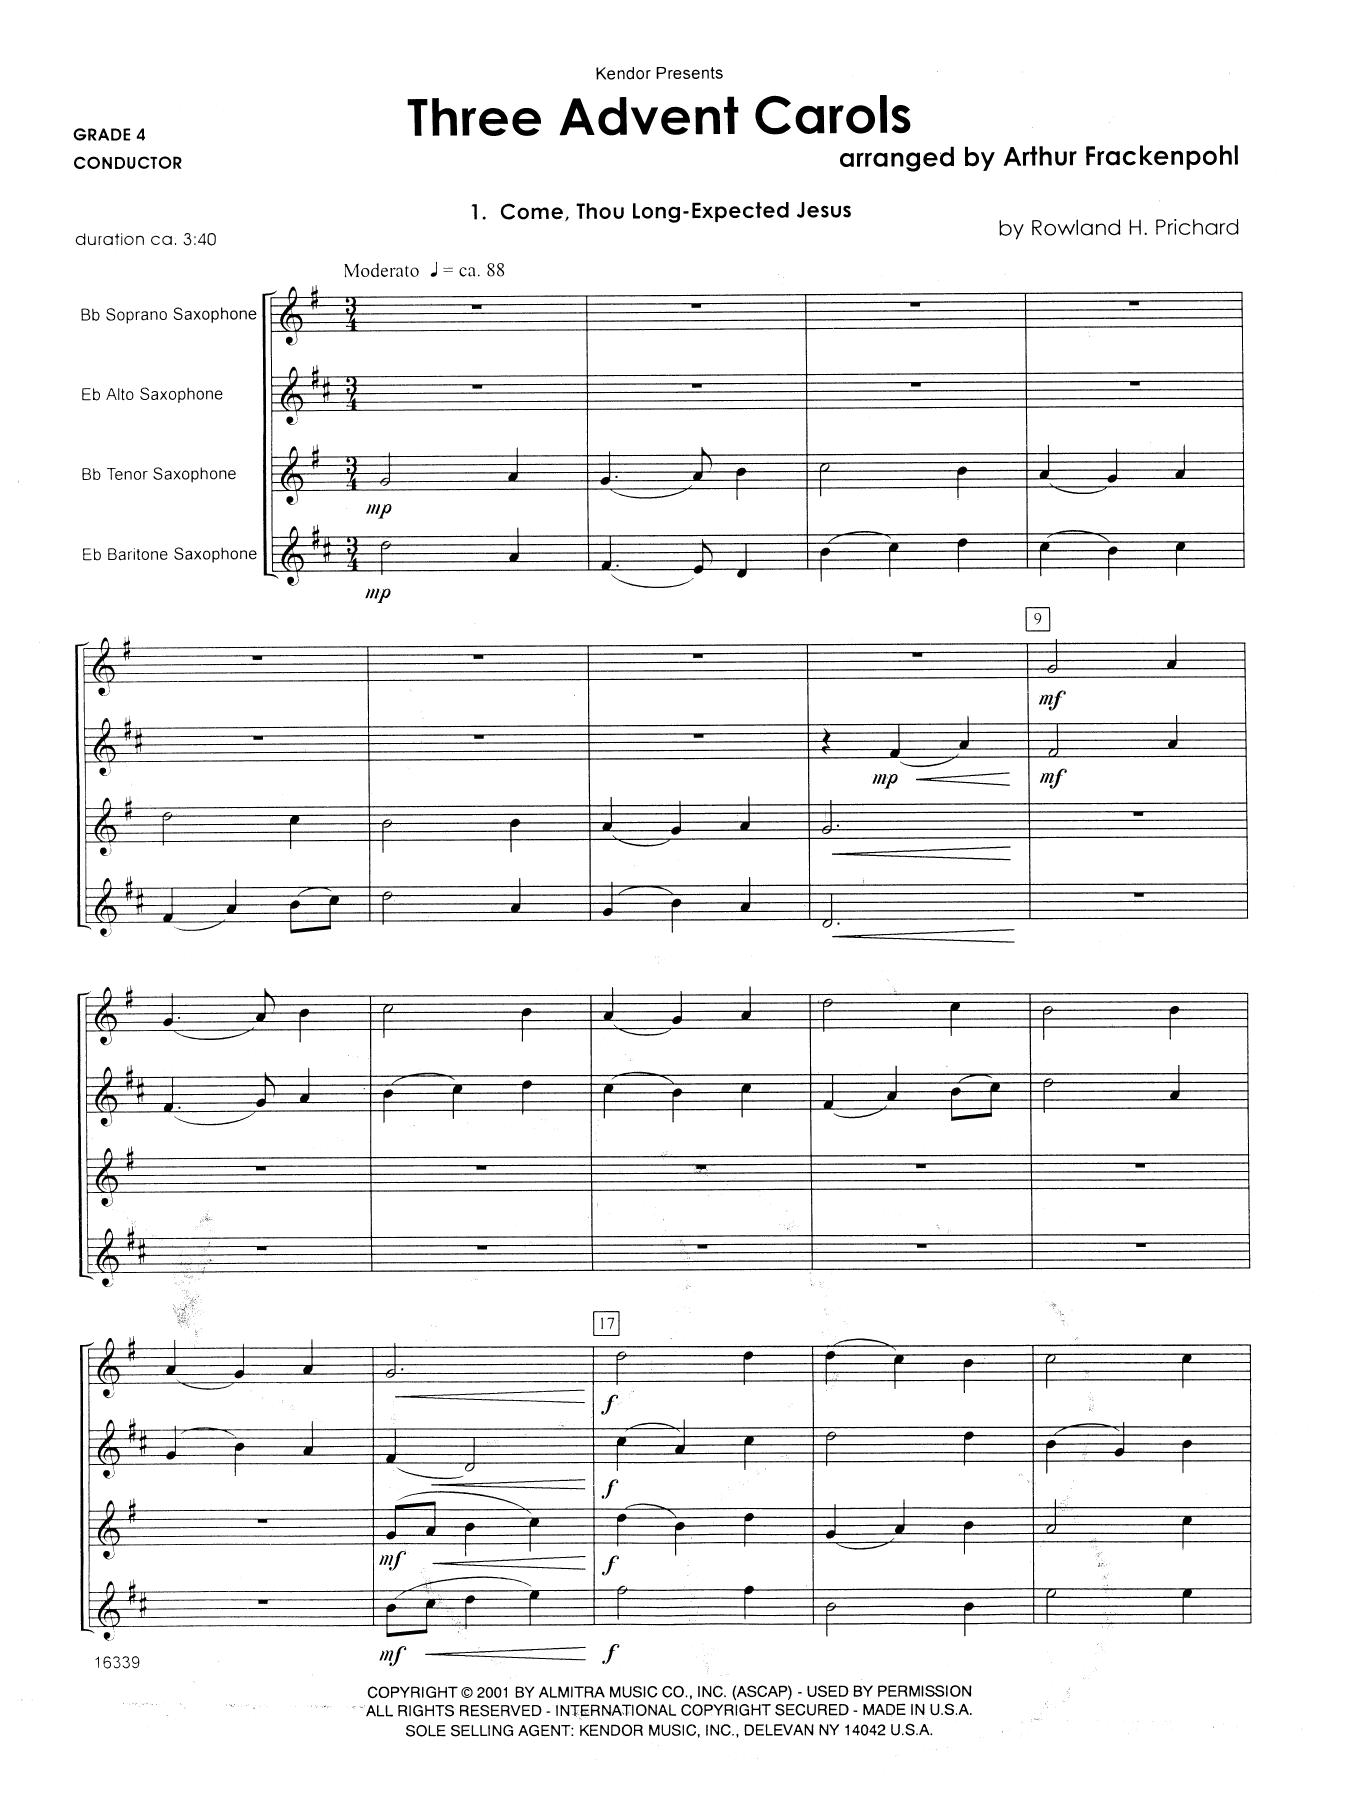 Three Advent Carols (COMPLETE) sheet music for wind ensemble by Arthur Frackenpohl